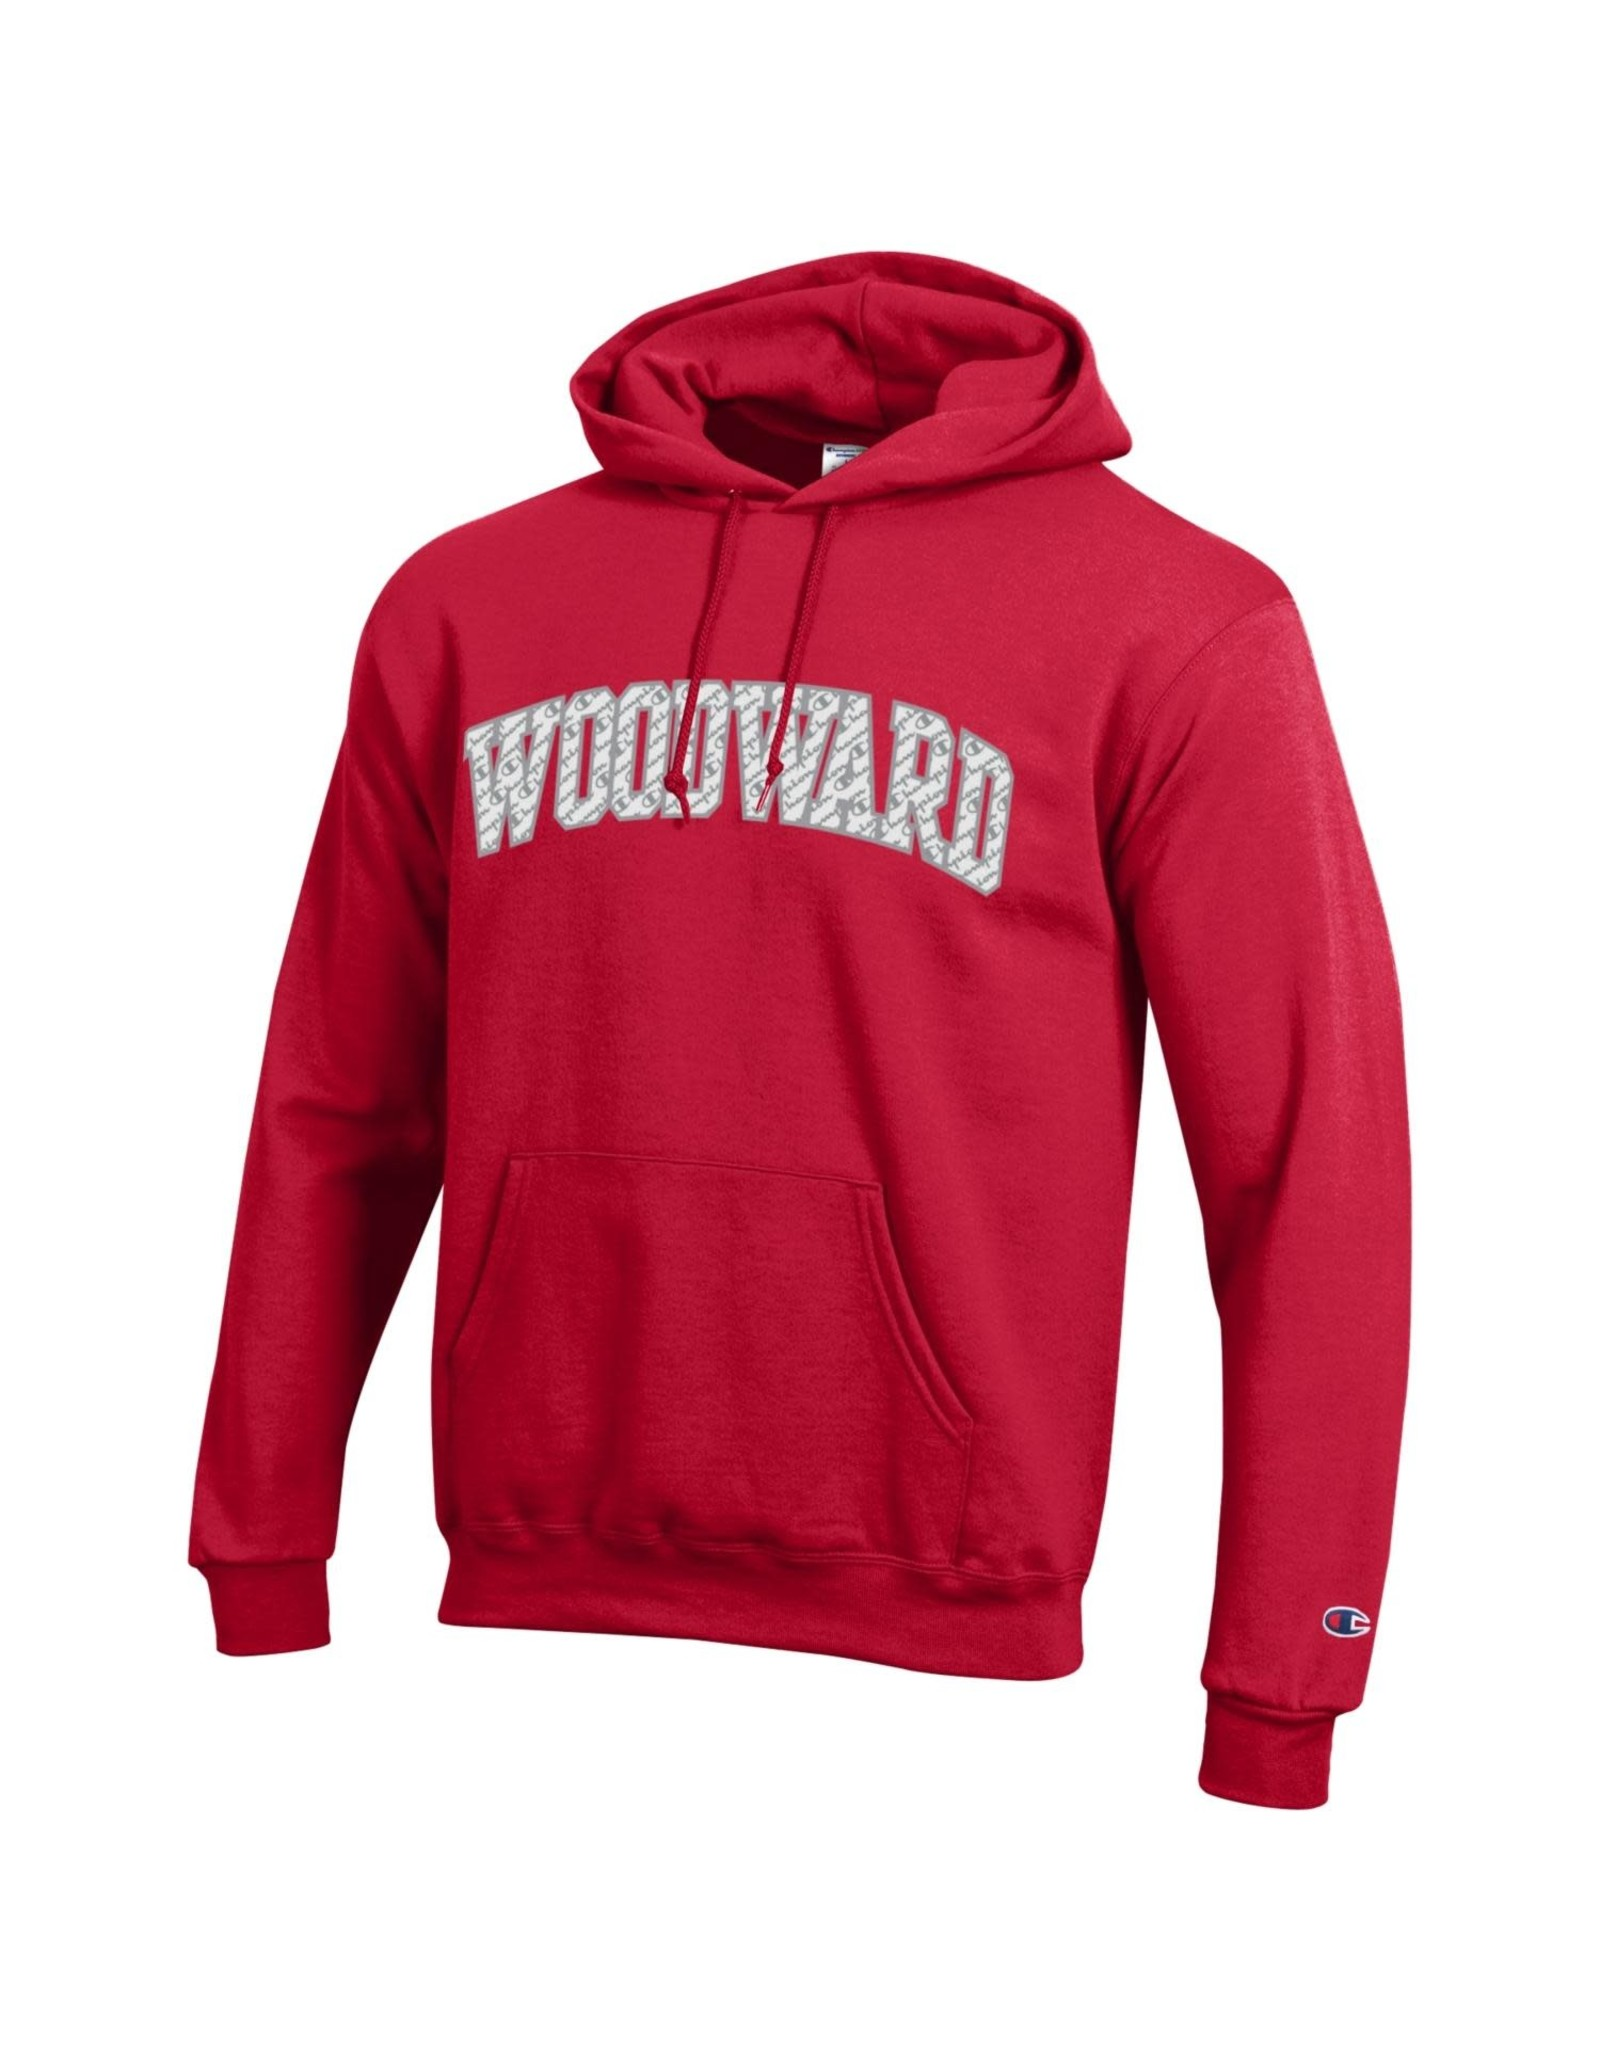 Champion Woodward Hooded Sweatshirt In Red